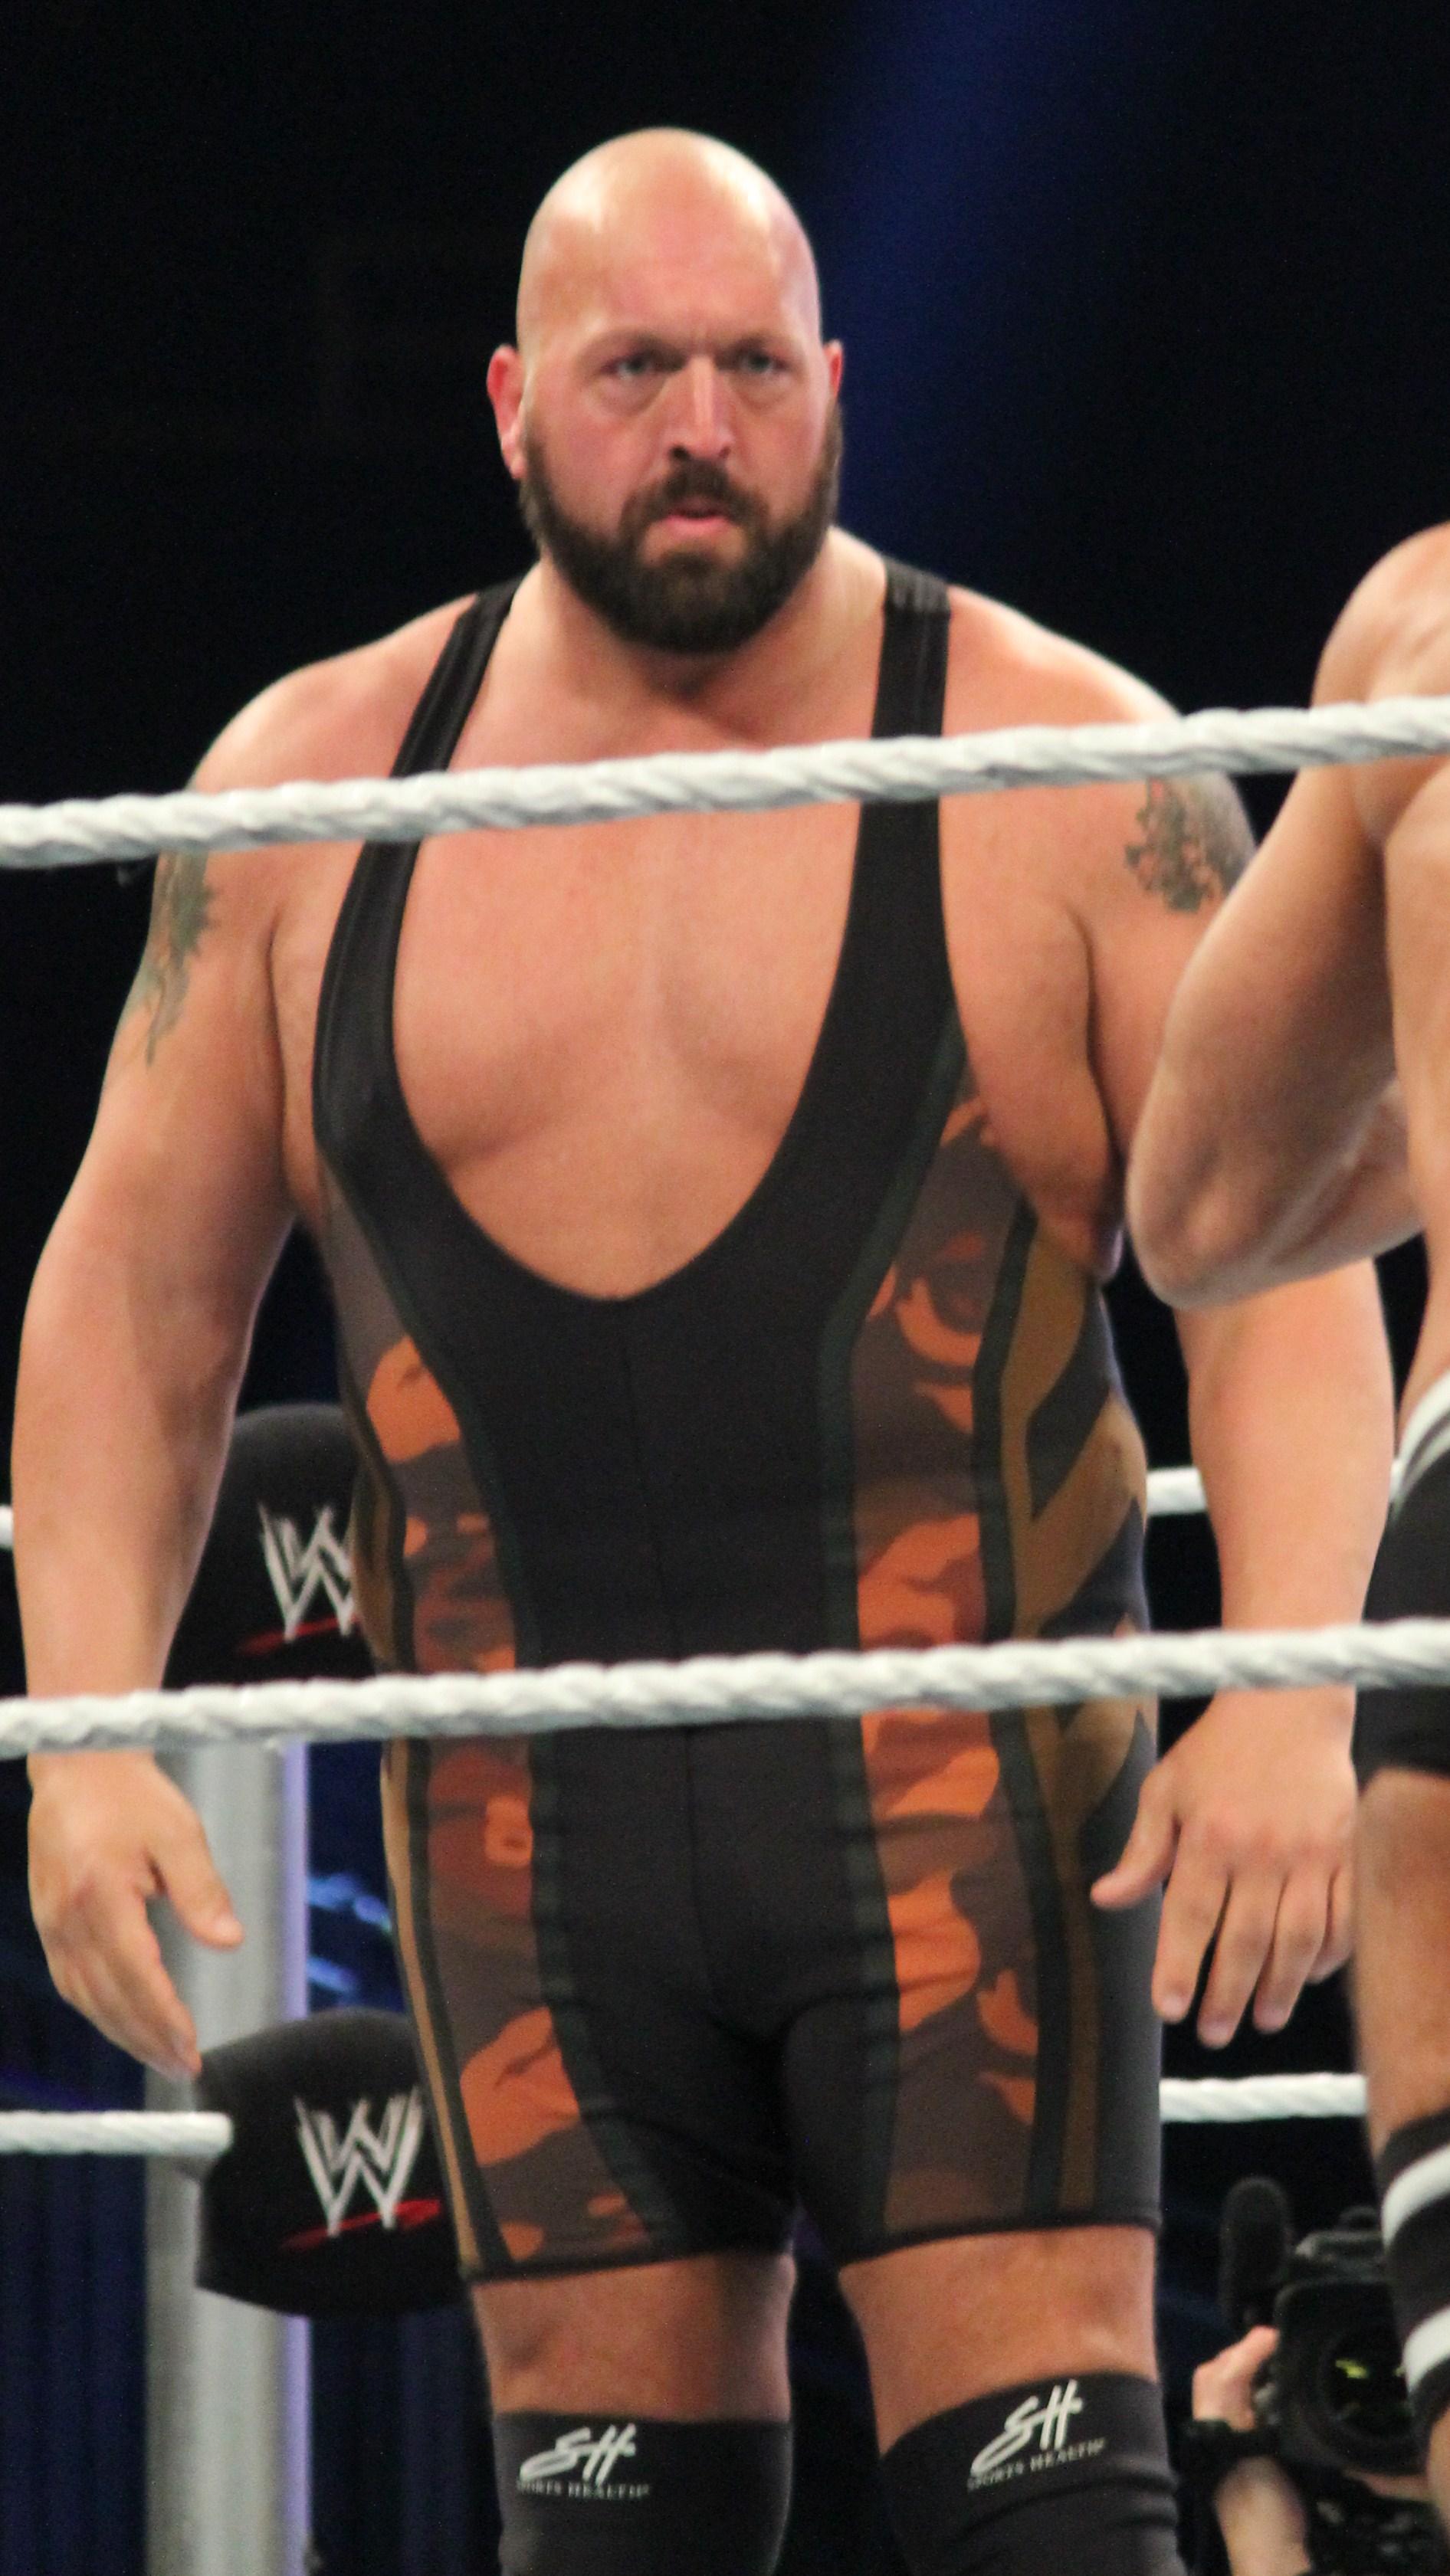 Destiny: Wrestling-Star The Big Show mag Destiny, aber nicht den RNG